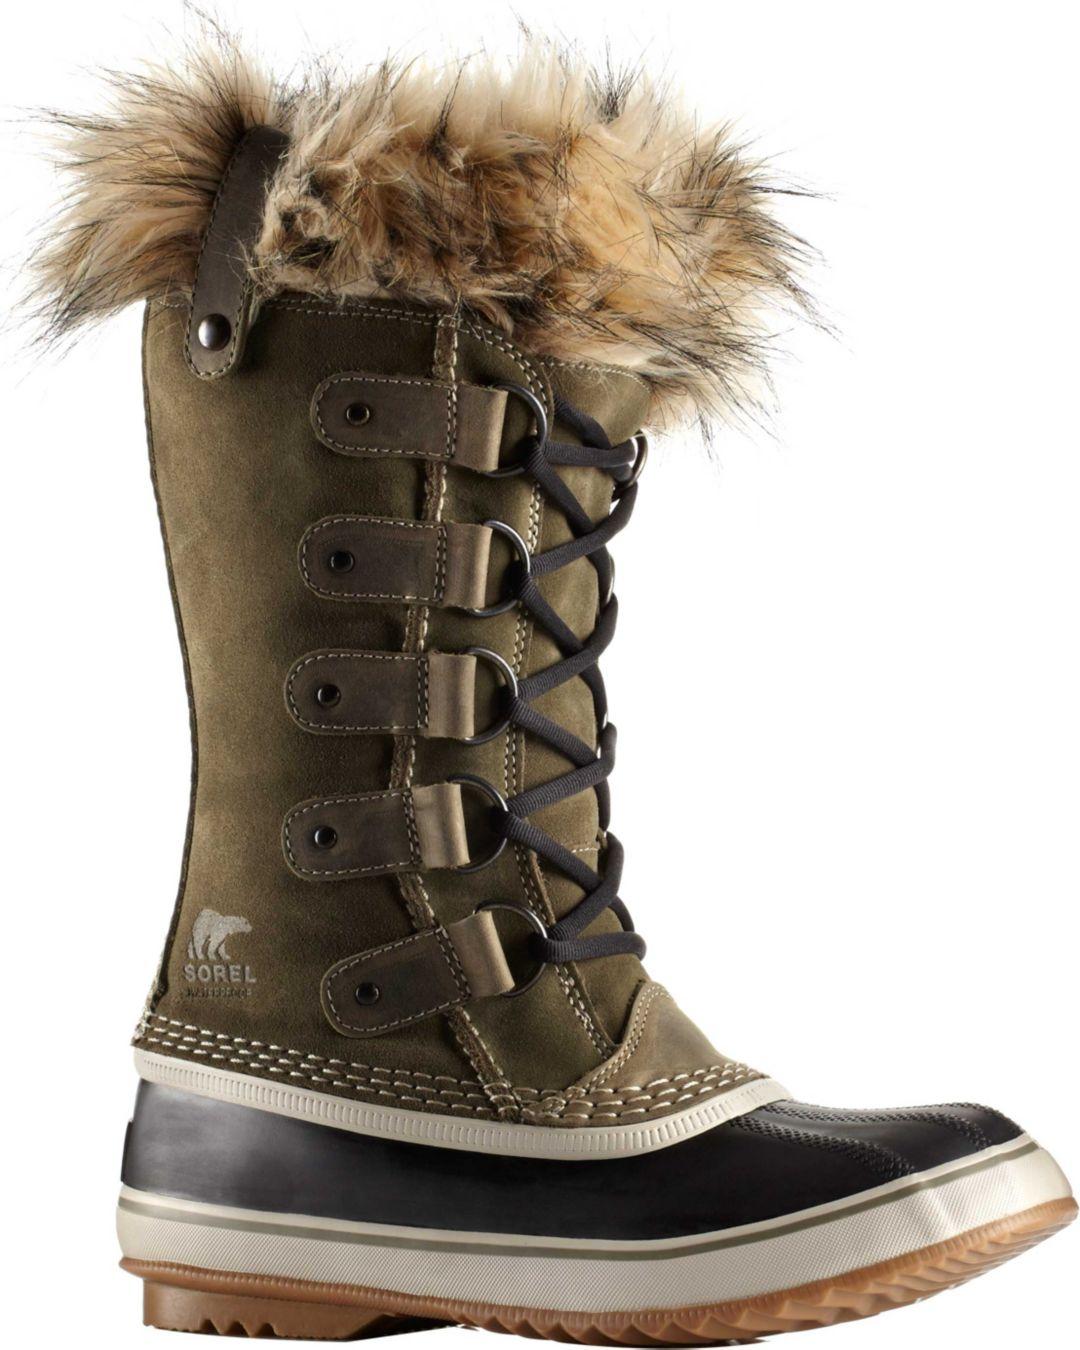 e634605b3 SOREL Women's Joan of Arctic Insulated Waterproof Winter Boots ...